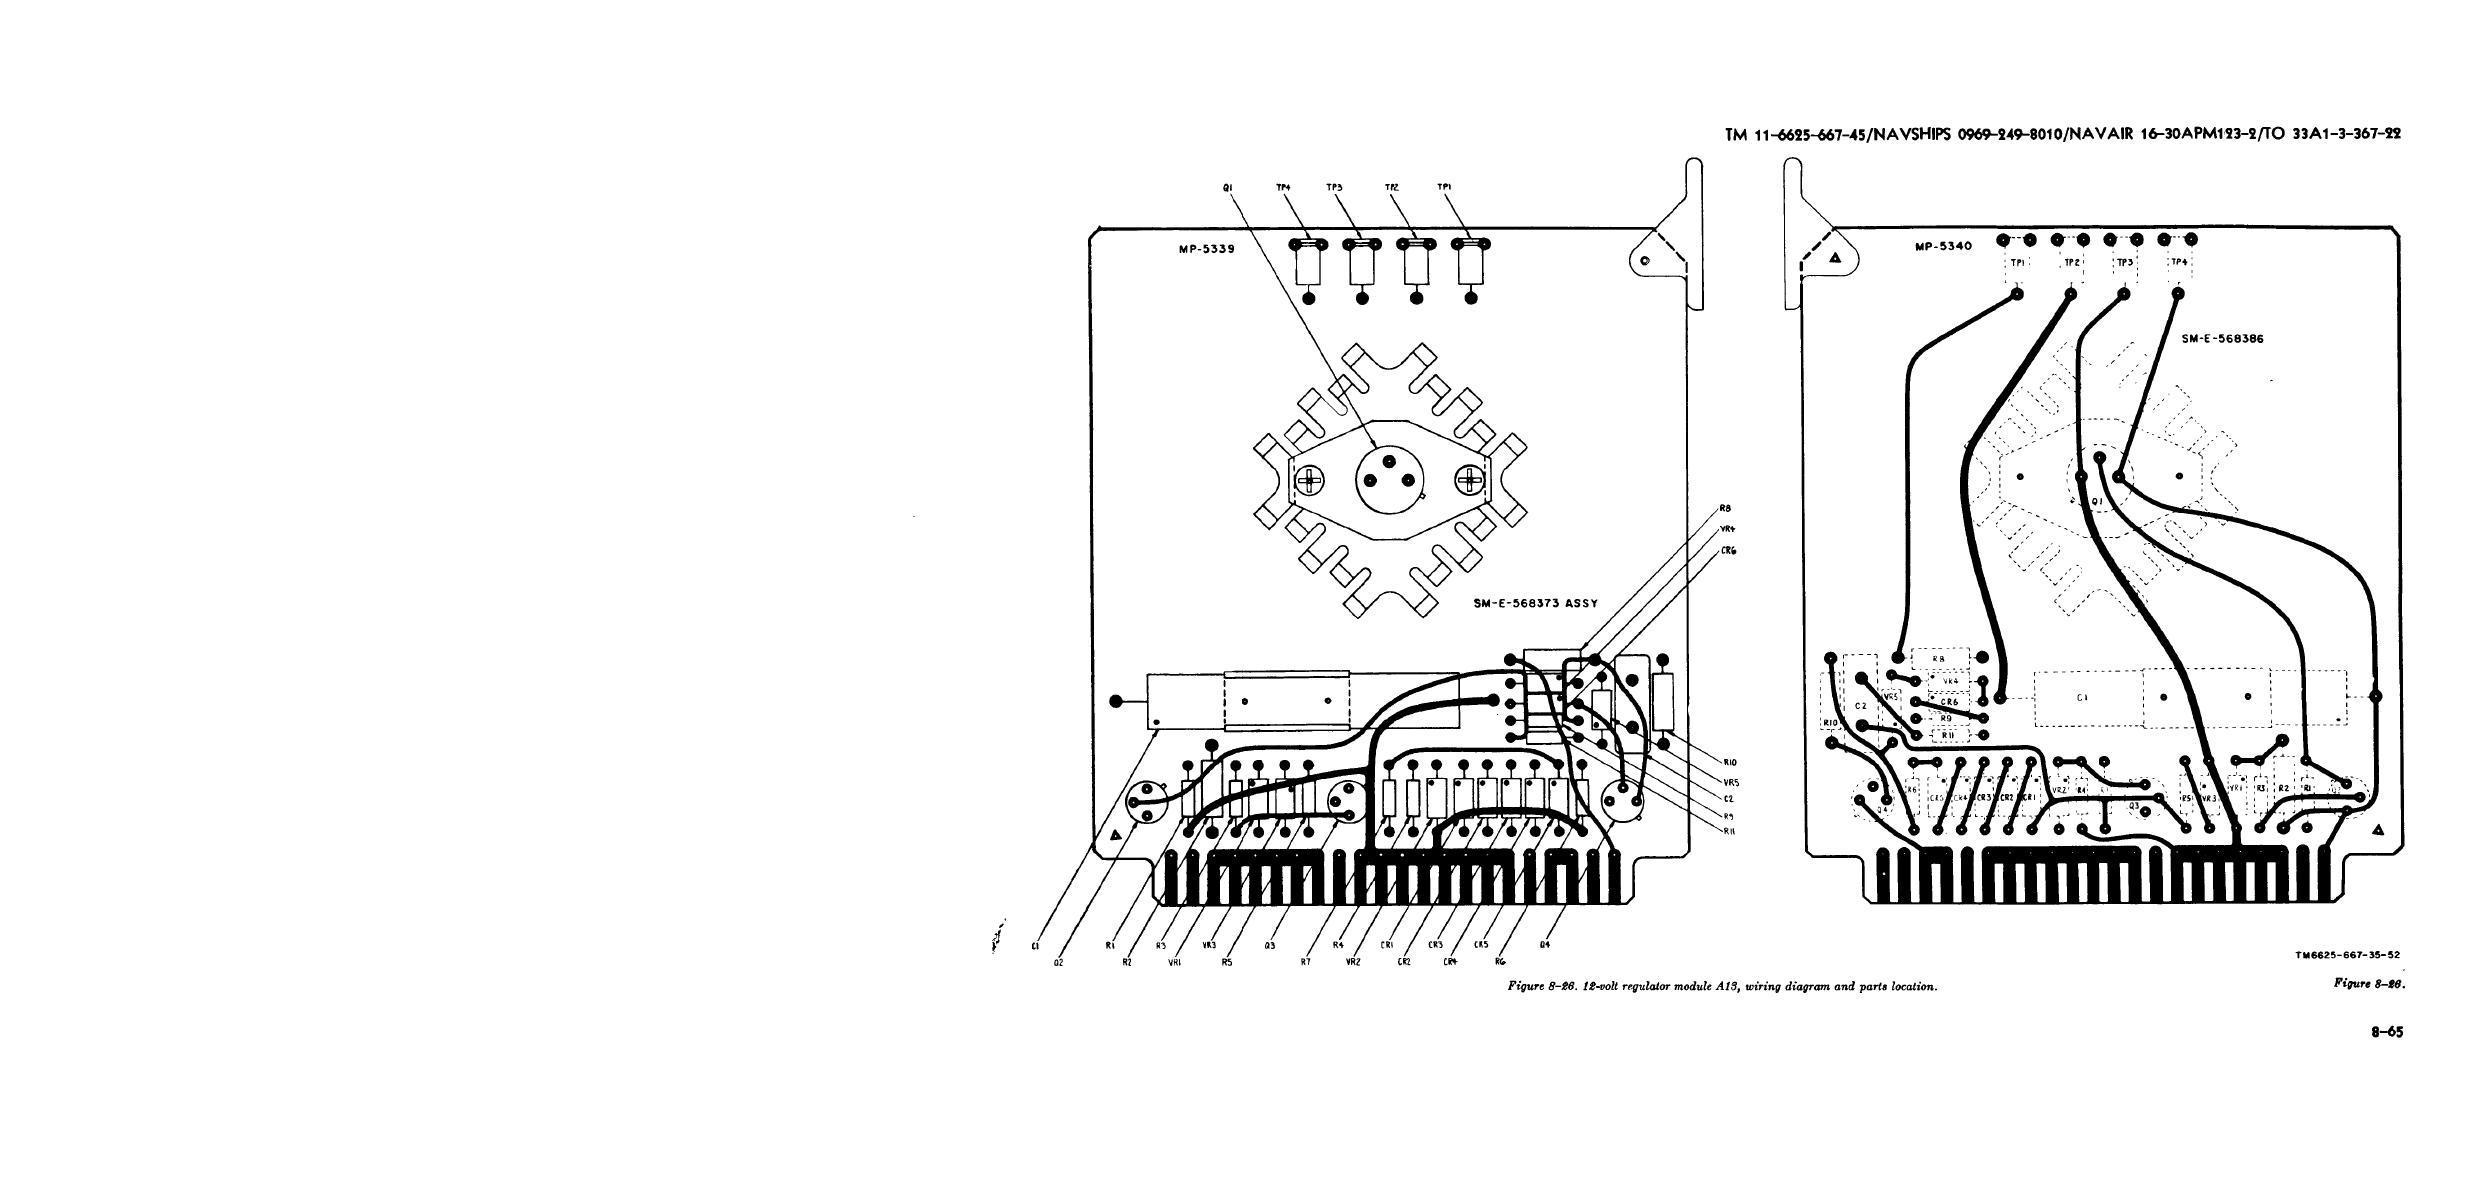 Figure 8 26 12 Volt Regulator Module A13 Wiring Diagram